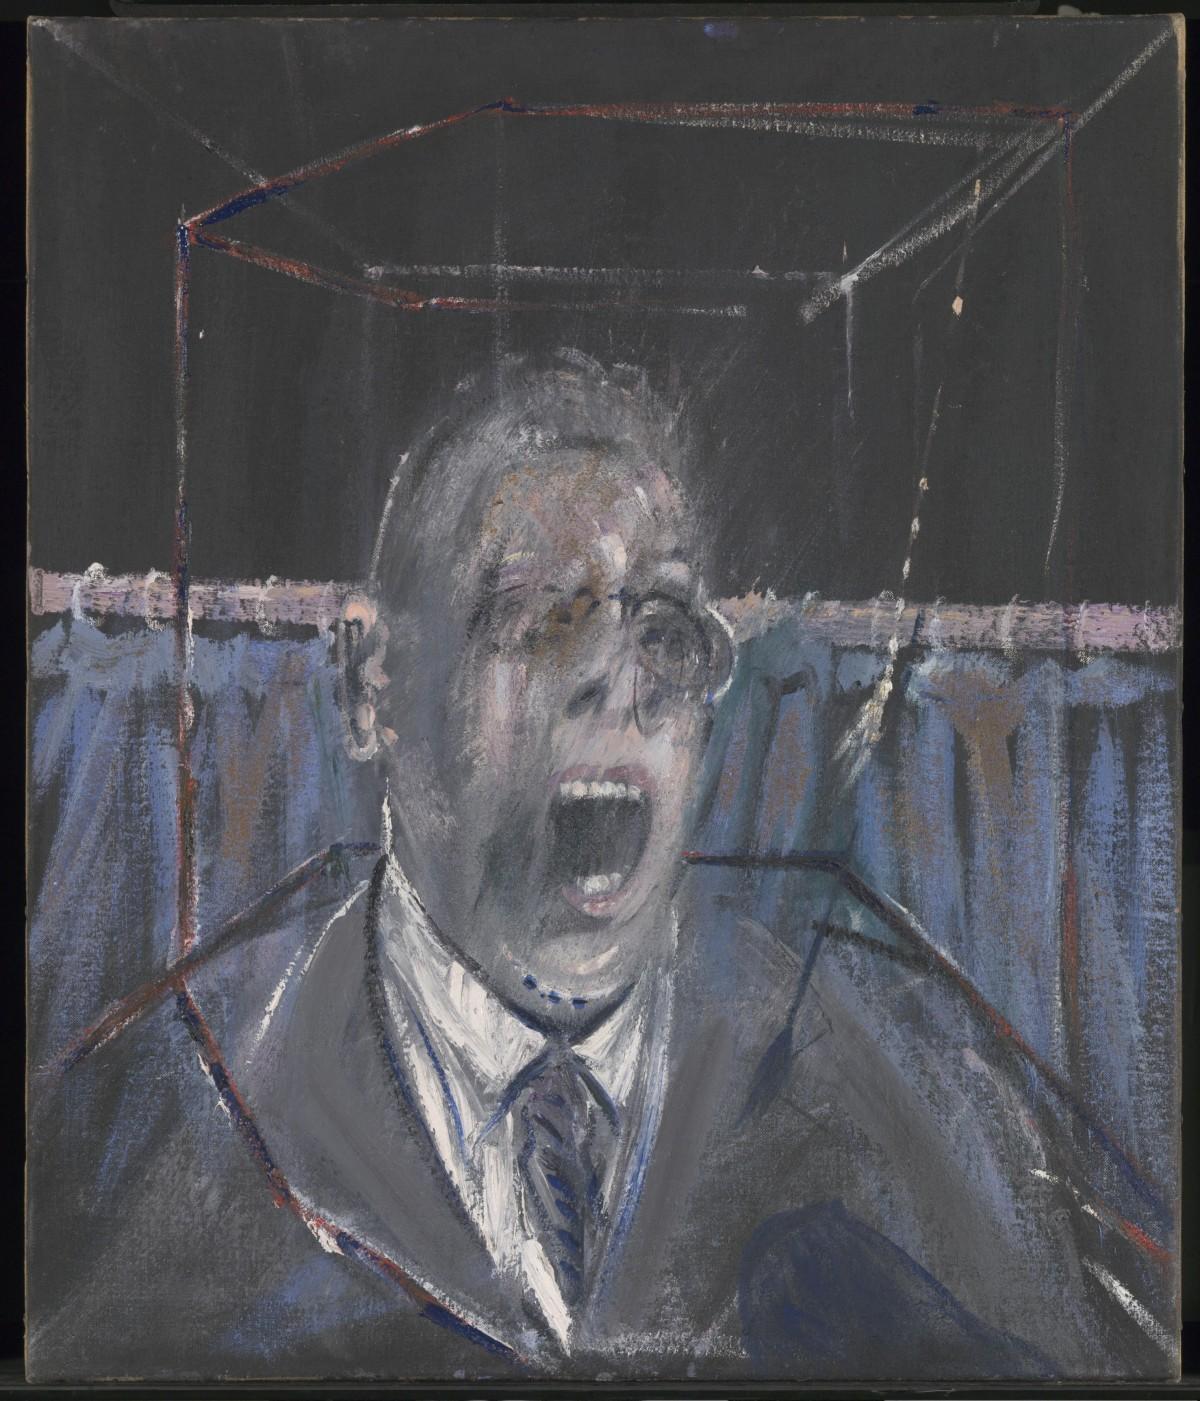 Francis Bacon's Study for a Portrai, 1952